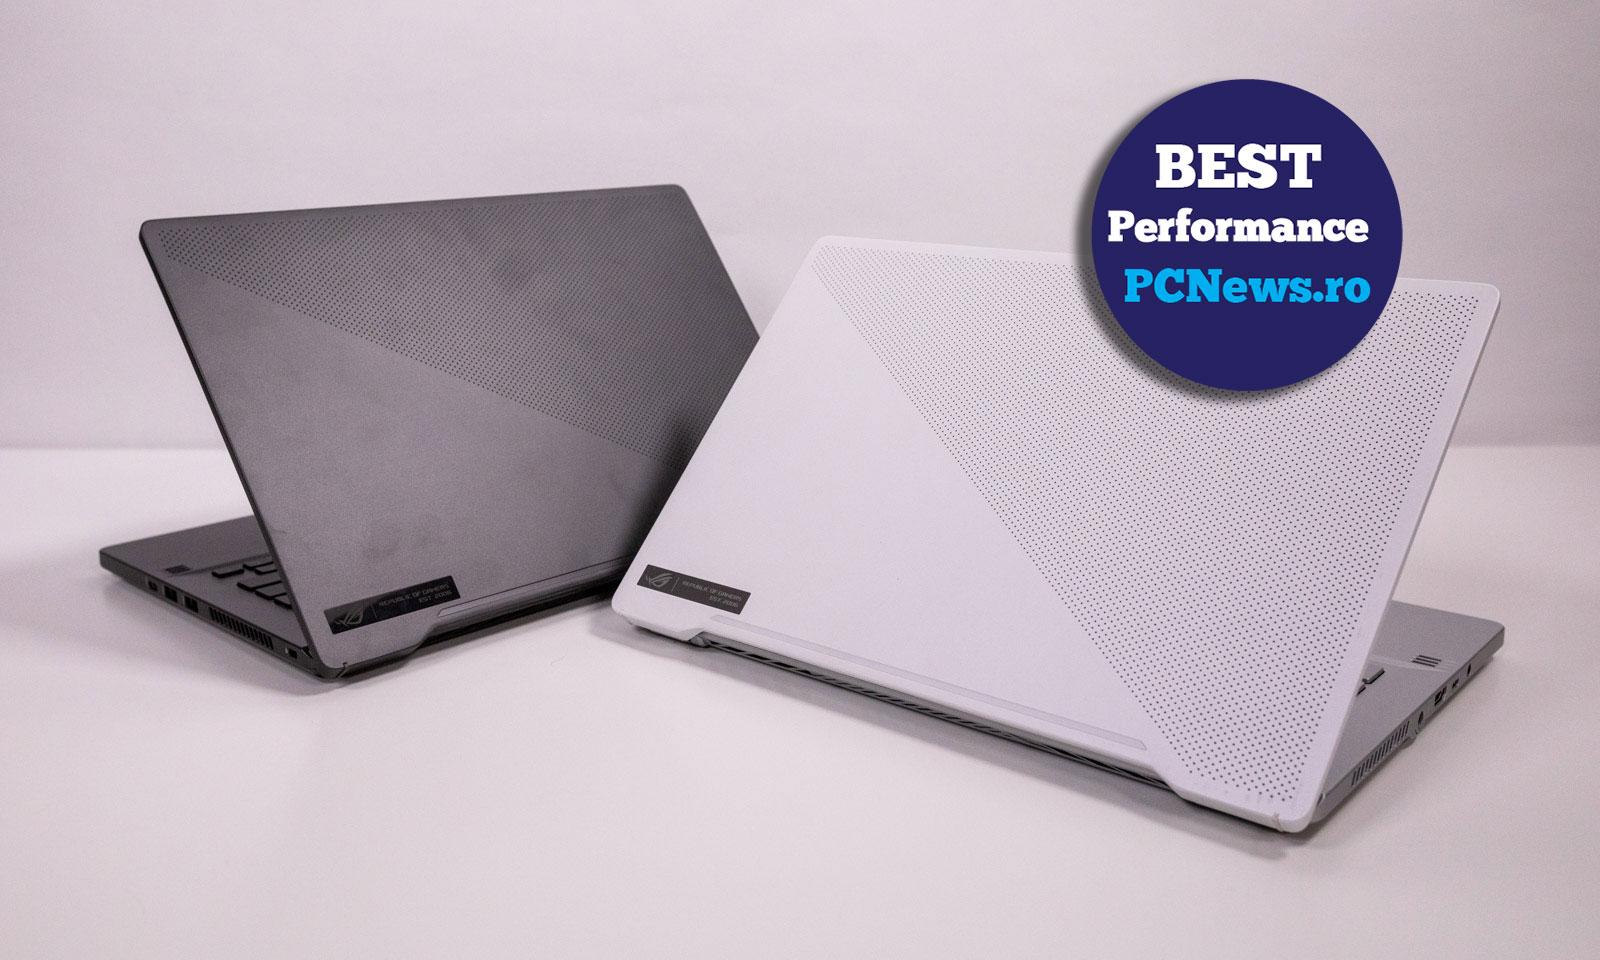 Laptopul ROG Zephyrus G14 GA401 premiat Best Performance